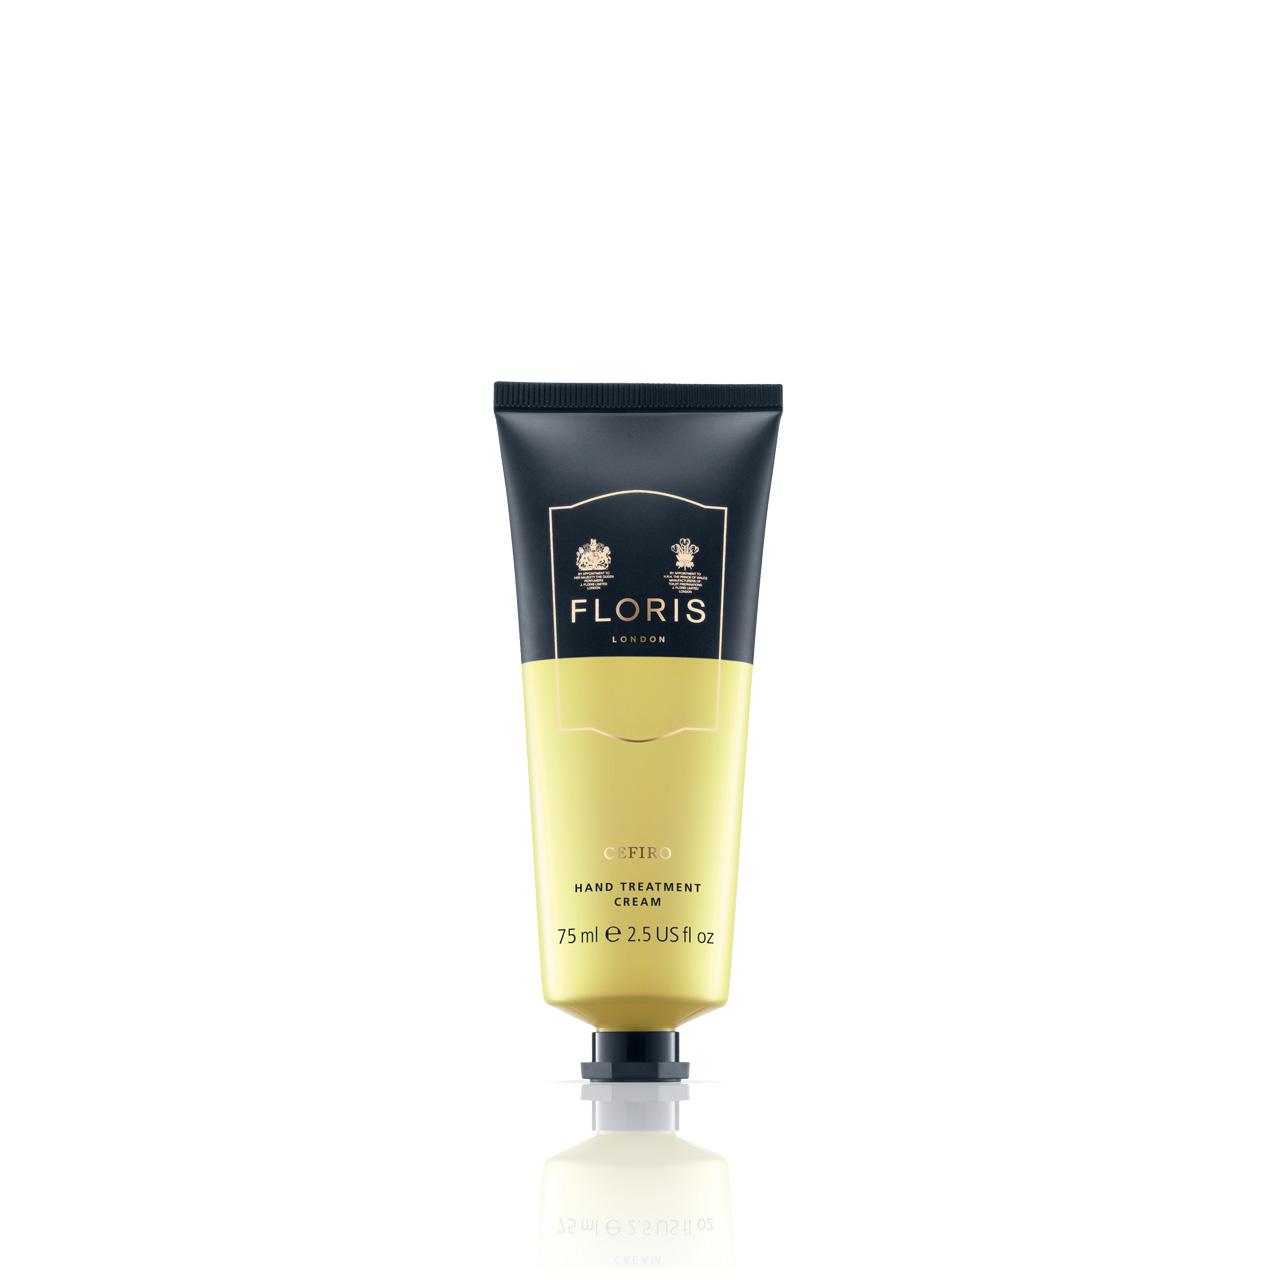 Cefiro - Hand Treatment Cream